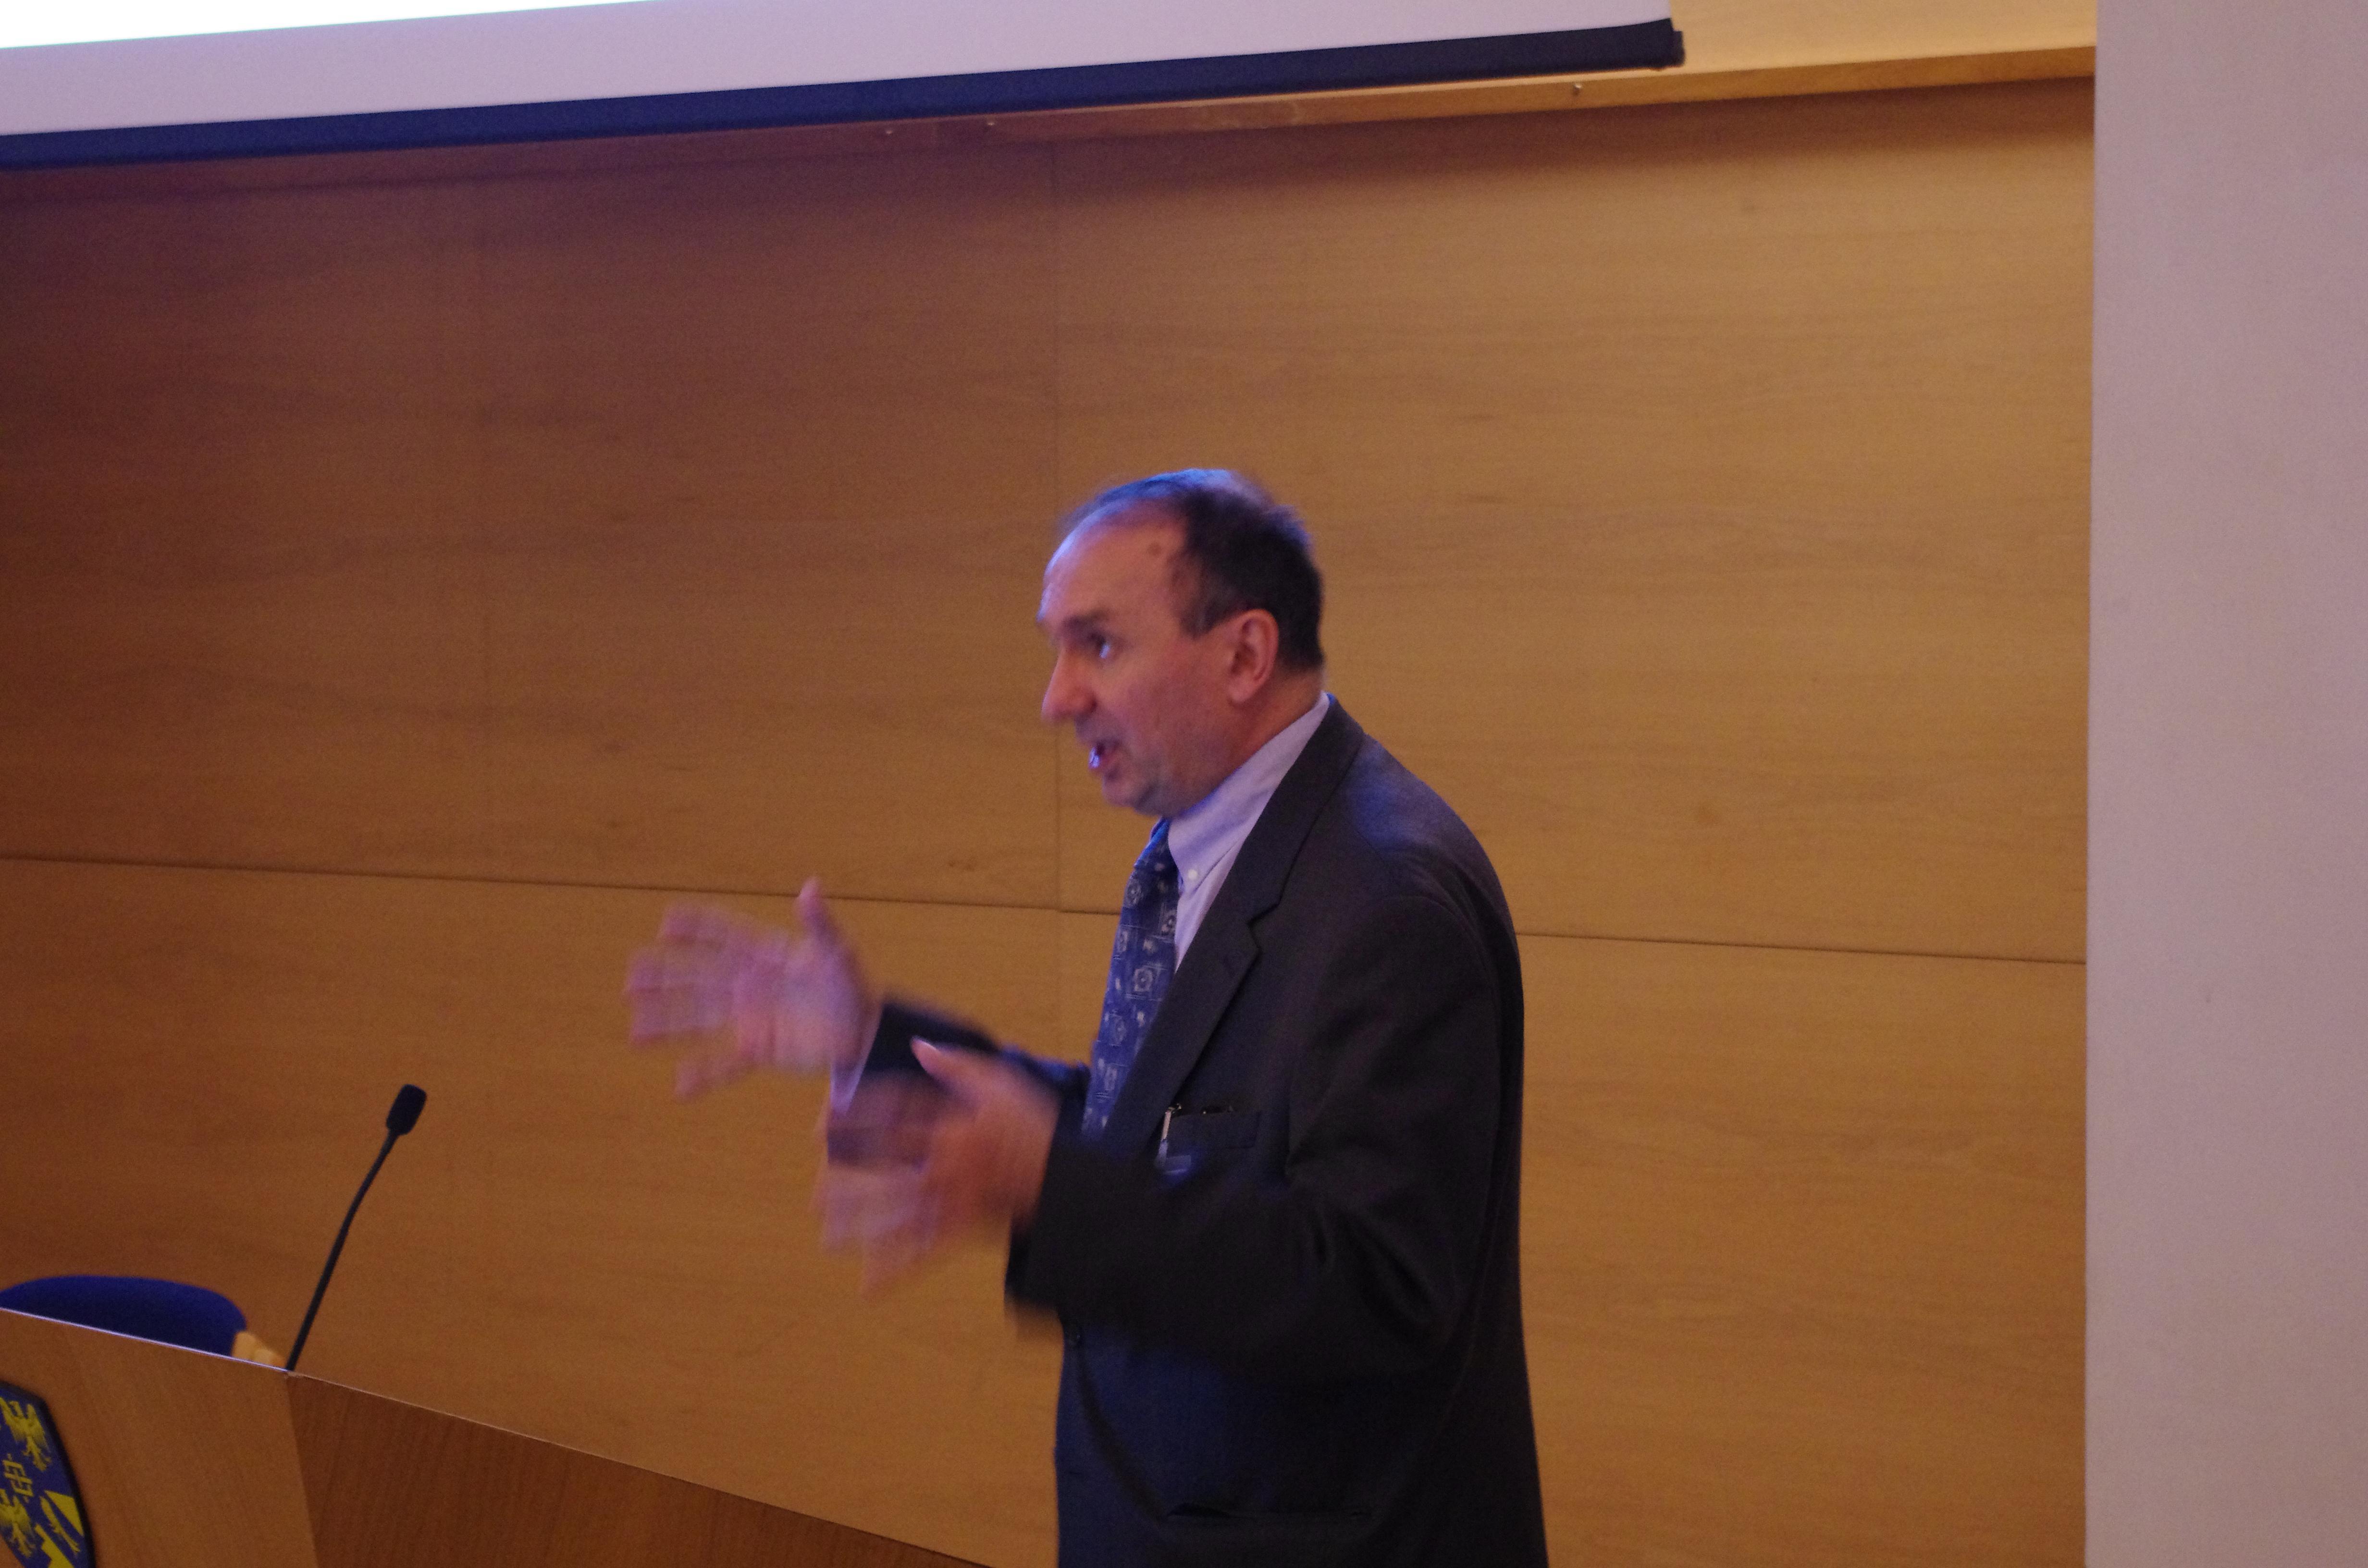 Professor Strbac illustrates the size of the problem